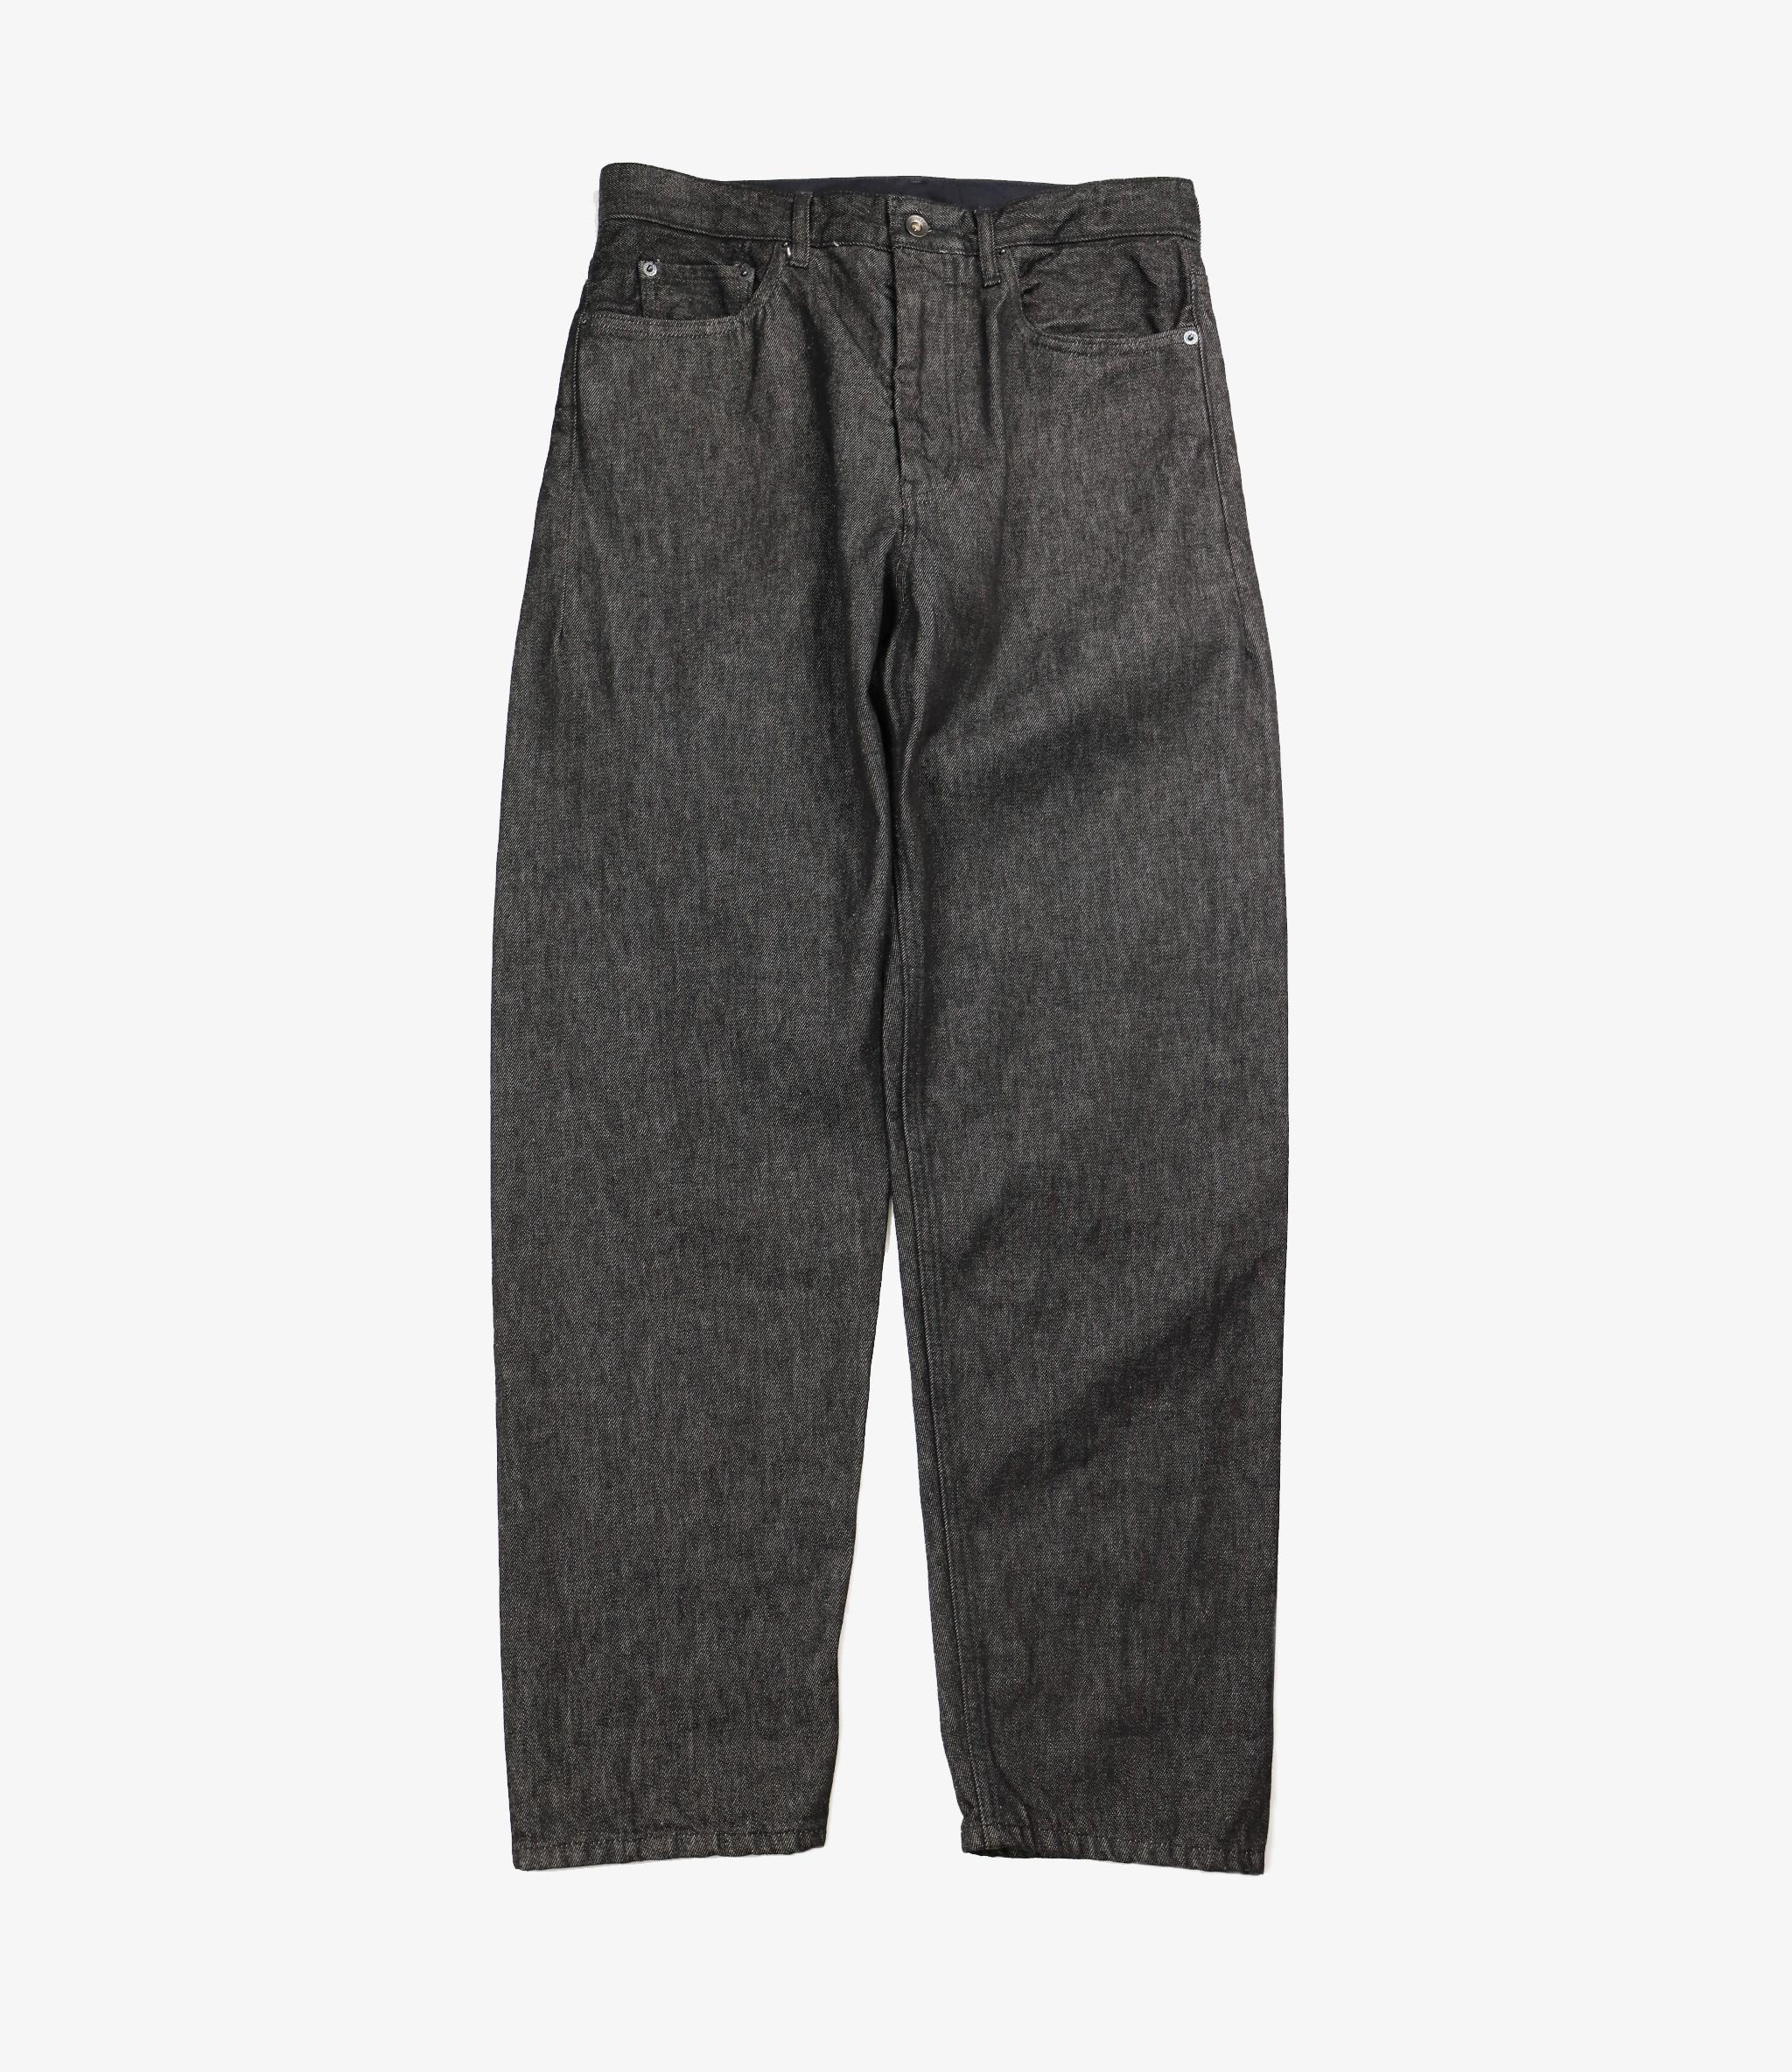 Engineered Garments Wide Peg Jean - Black 12oz Cone Denim